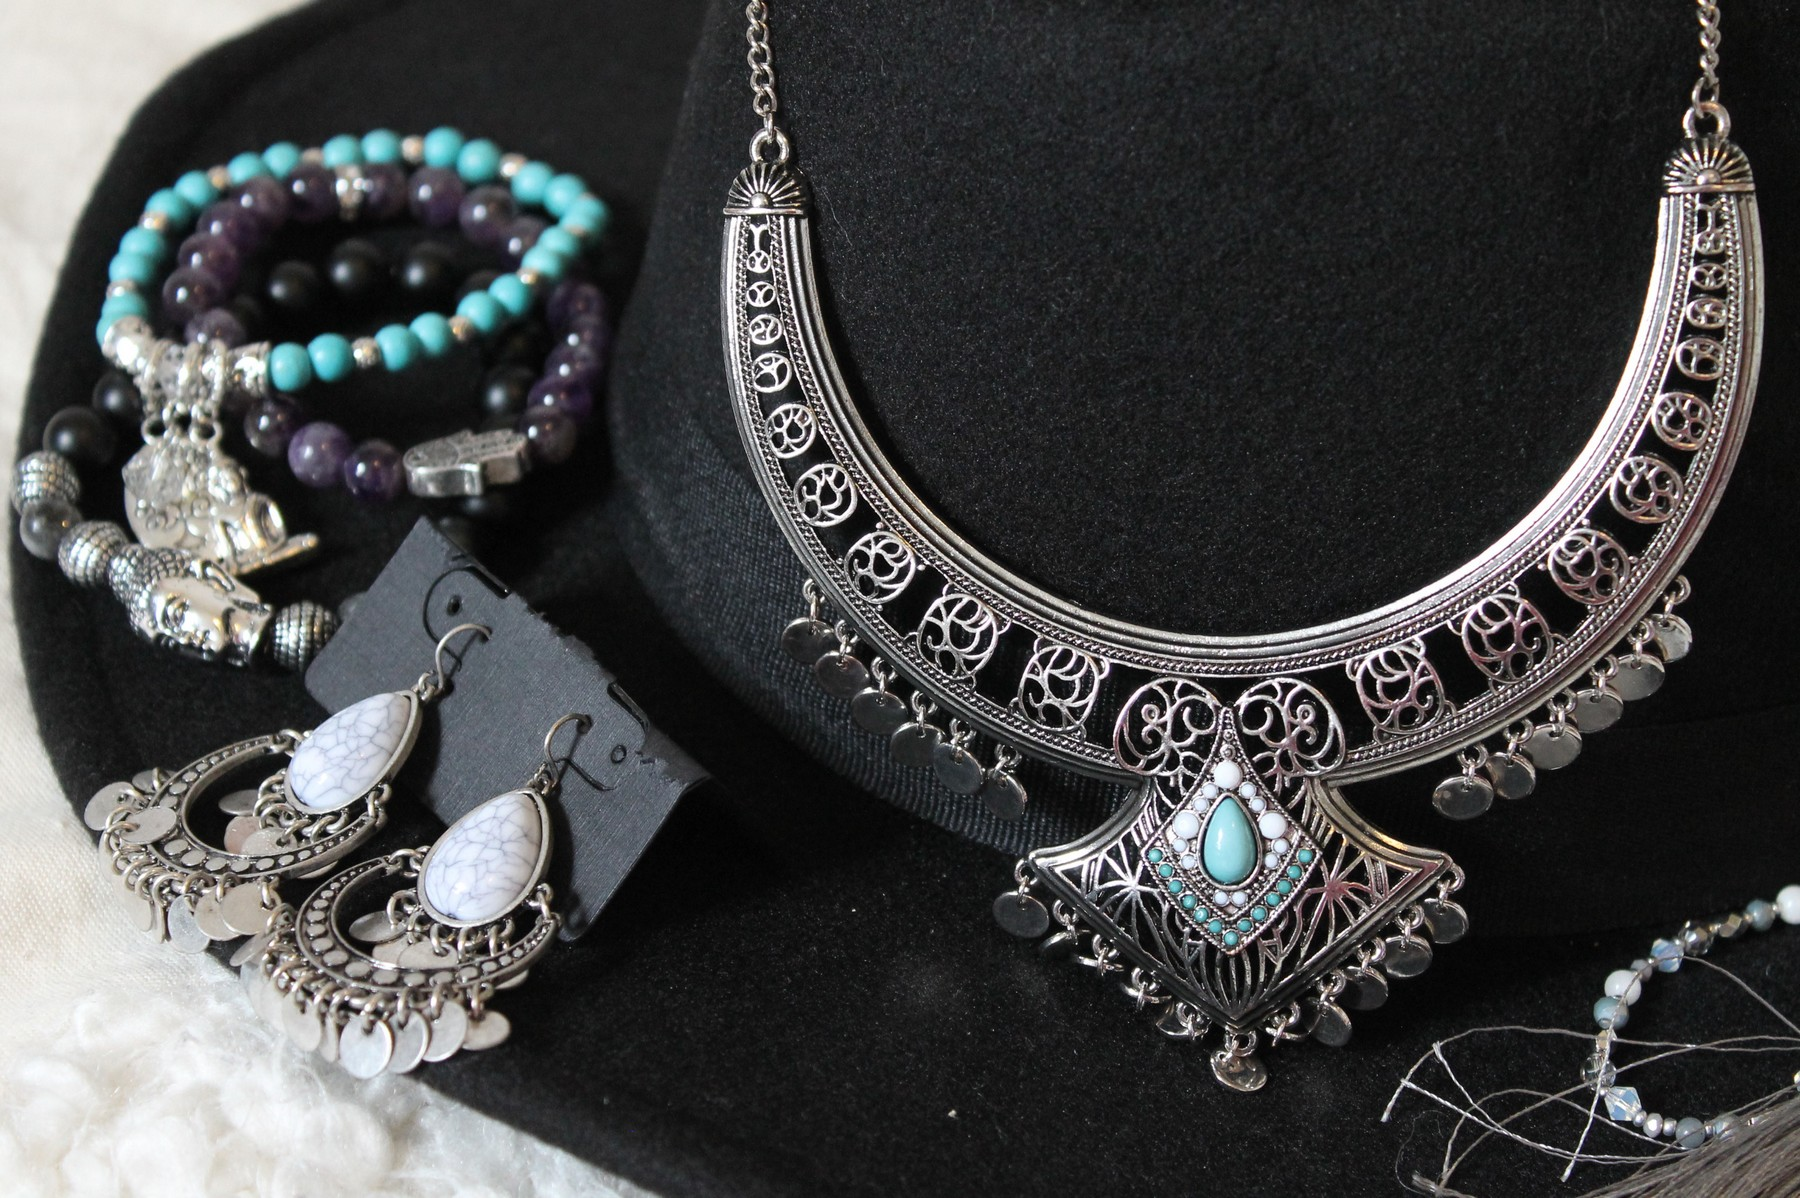 Initials cb bijou brigitte initials cb Bijoux brigitte catalogue